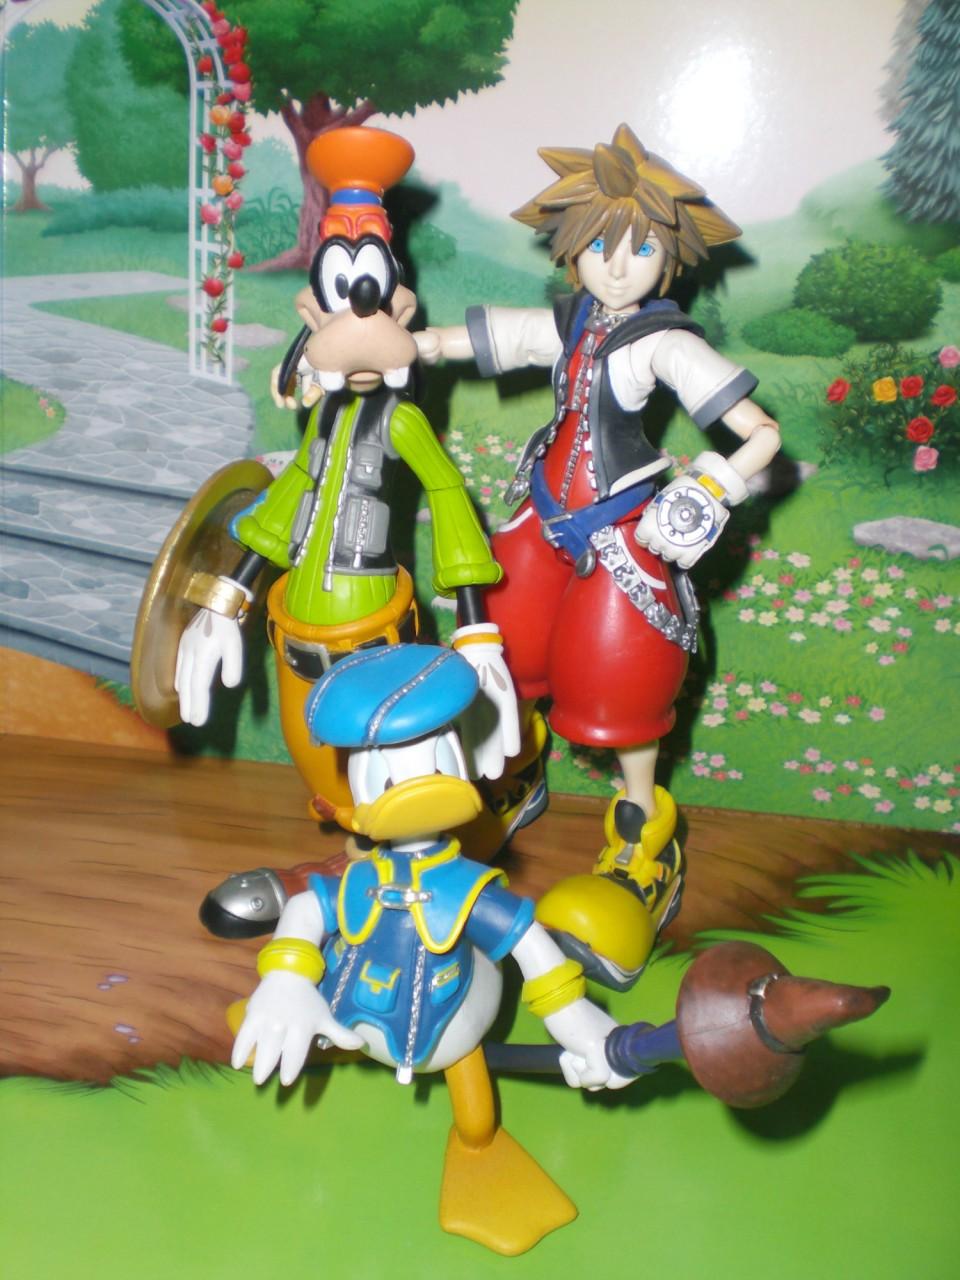 kotobukiya square_enix play_arts kingdom_hearts sora